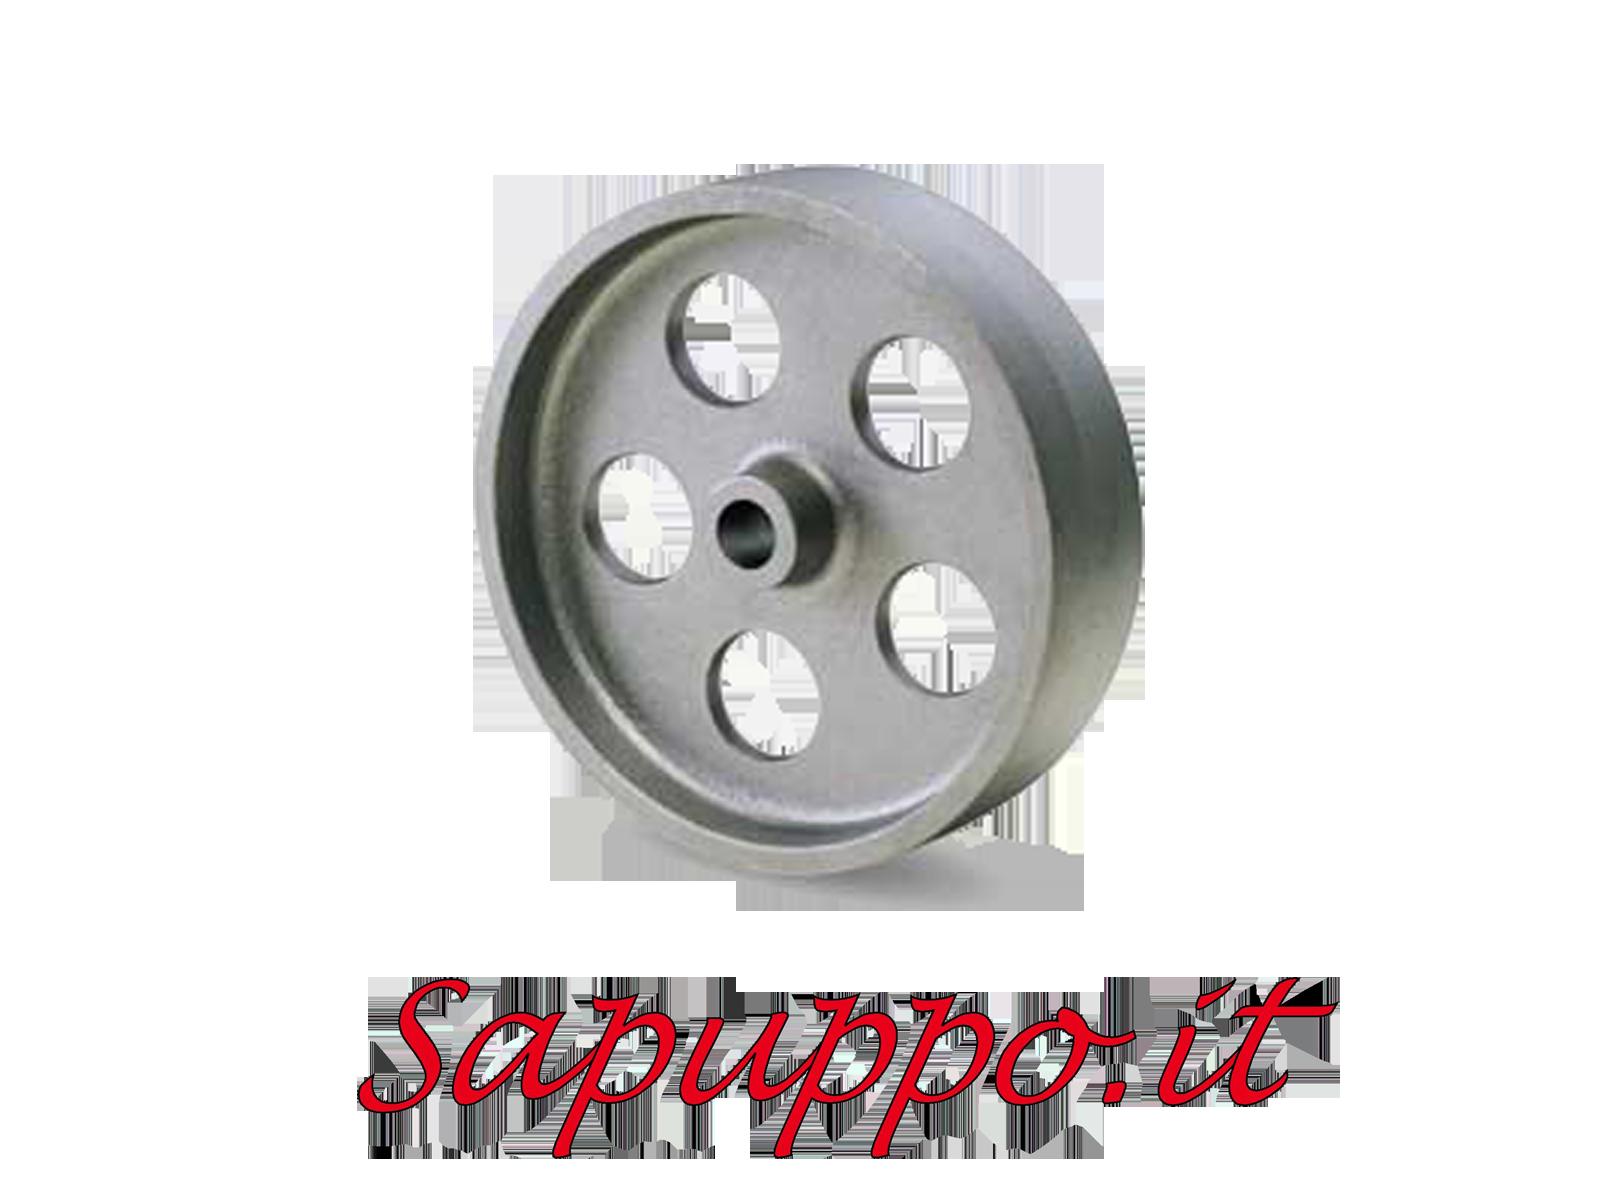 Ruote In Metallo.Sapuppo It Ruote In Ghisa Art 114